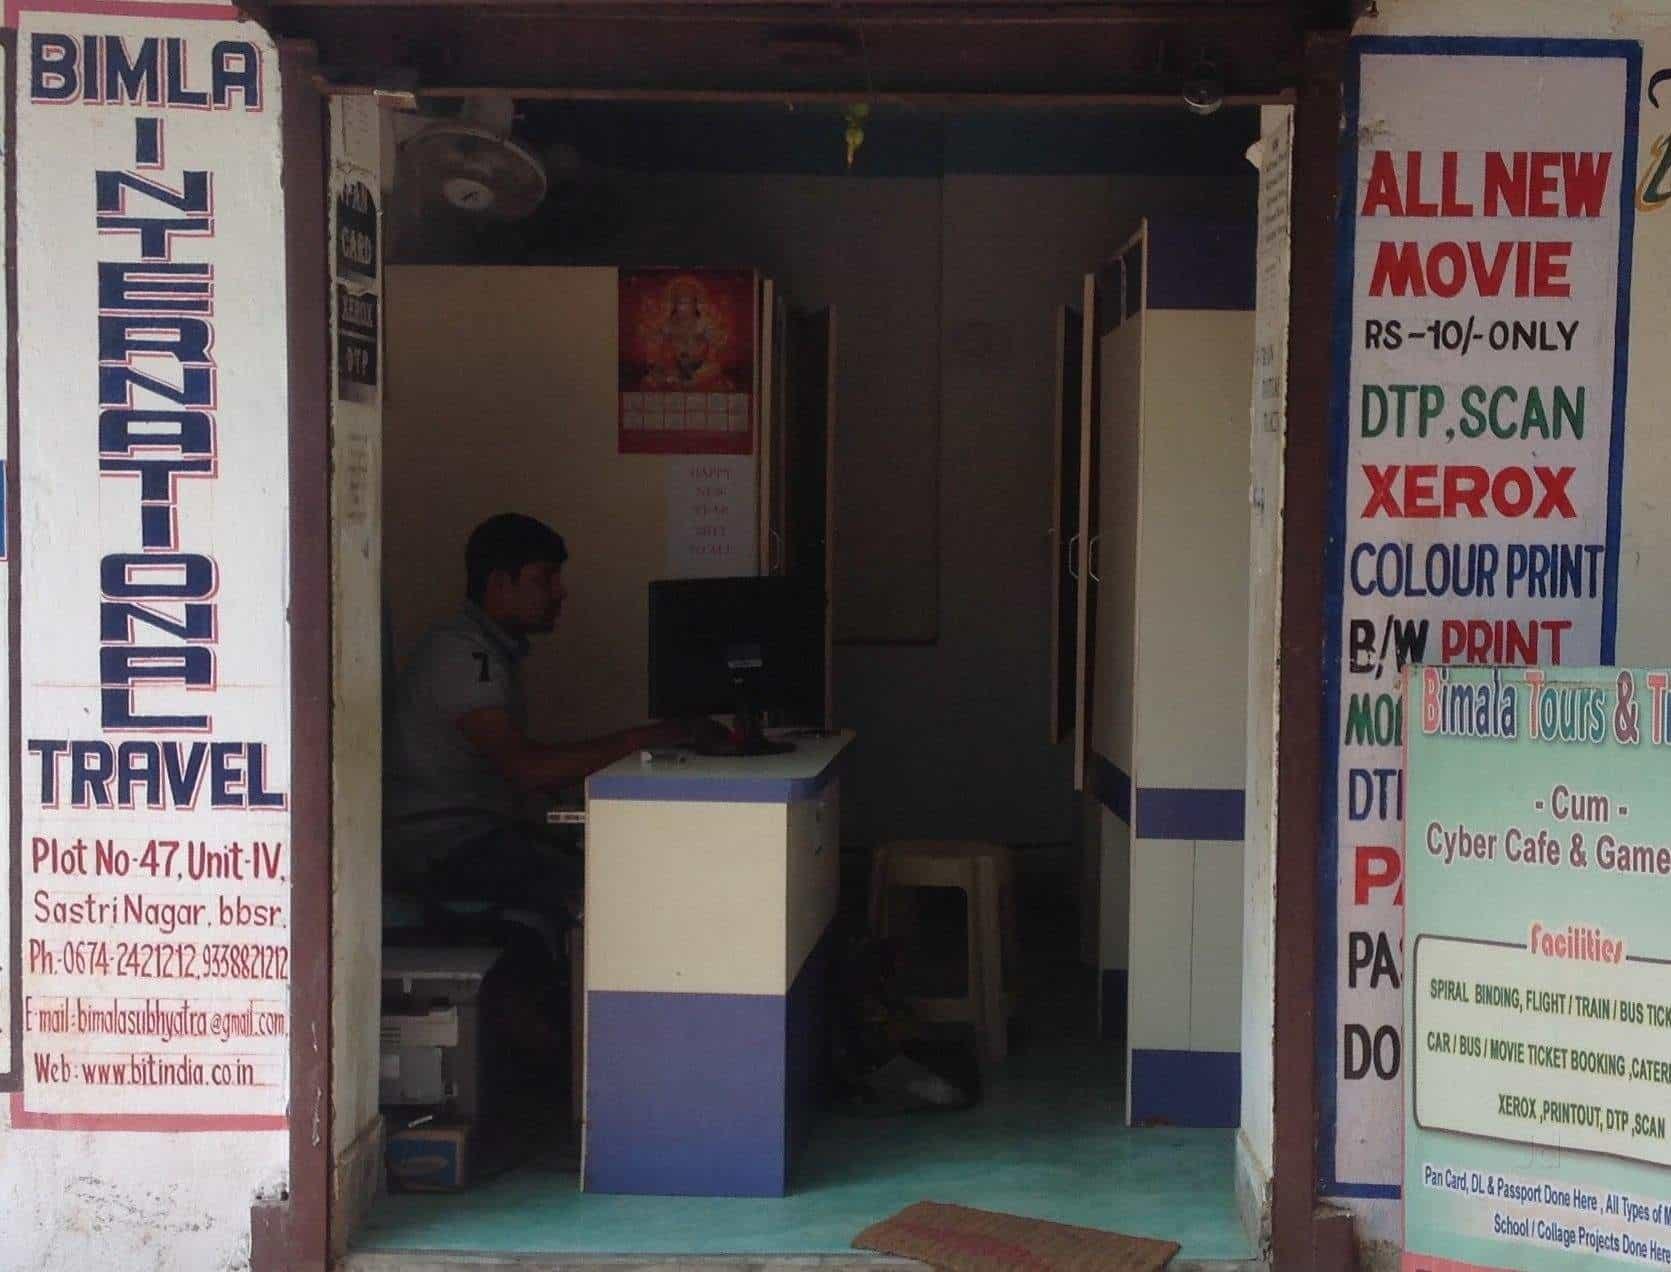 Bimla International Travel, Sahid Nagar - Travel Agents in